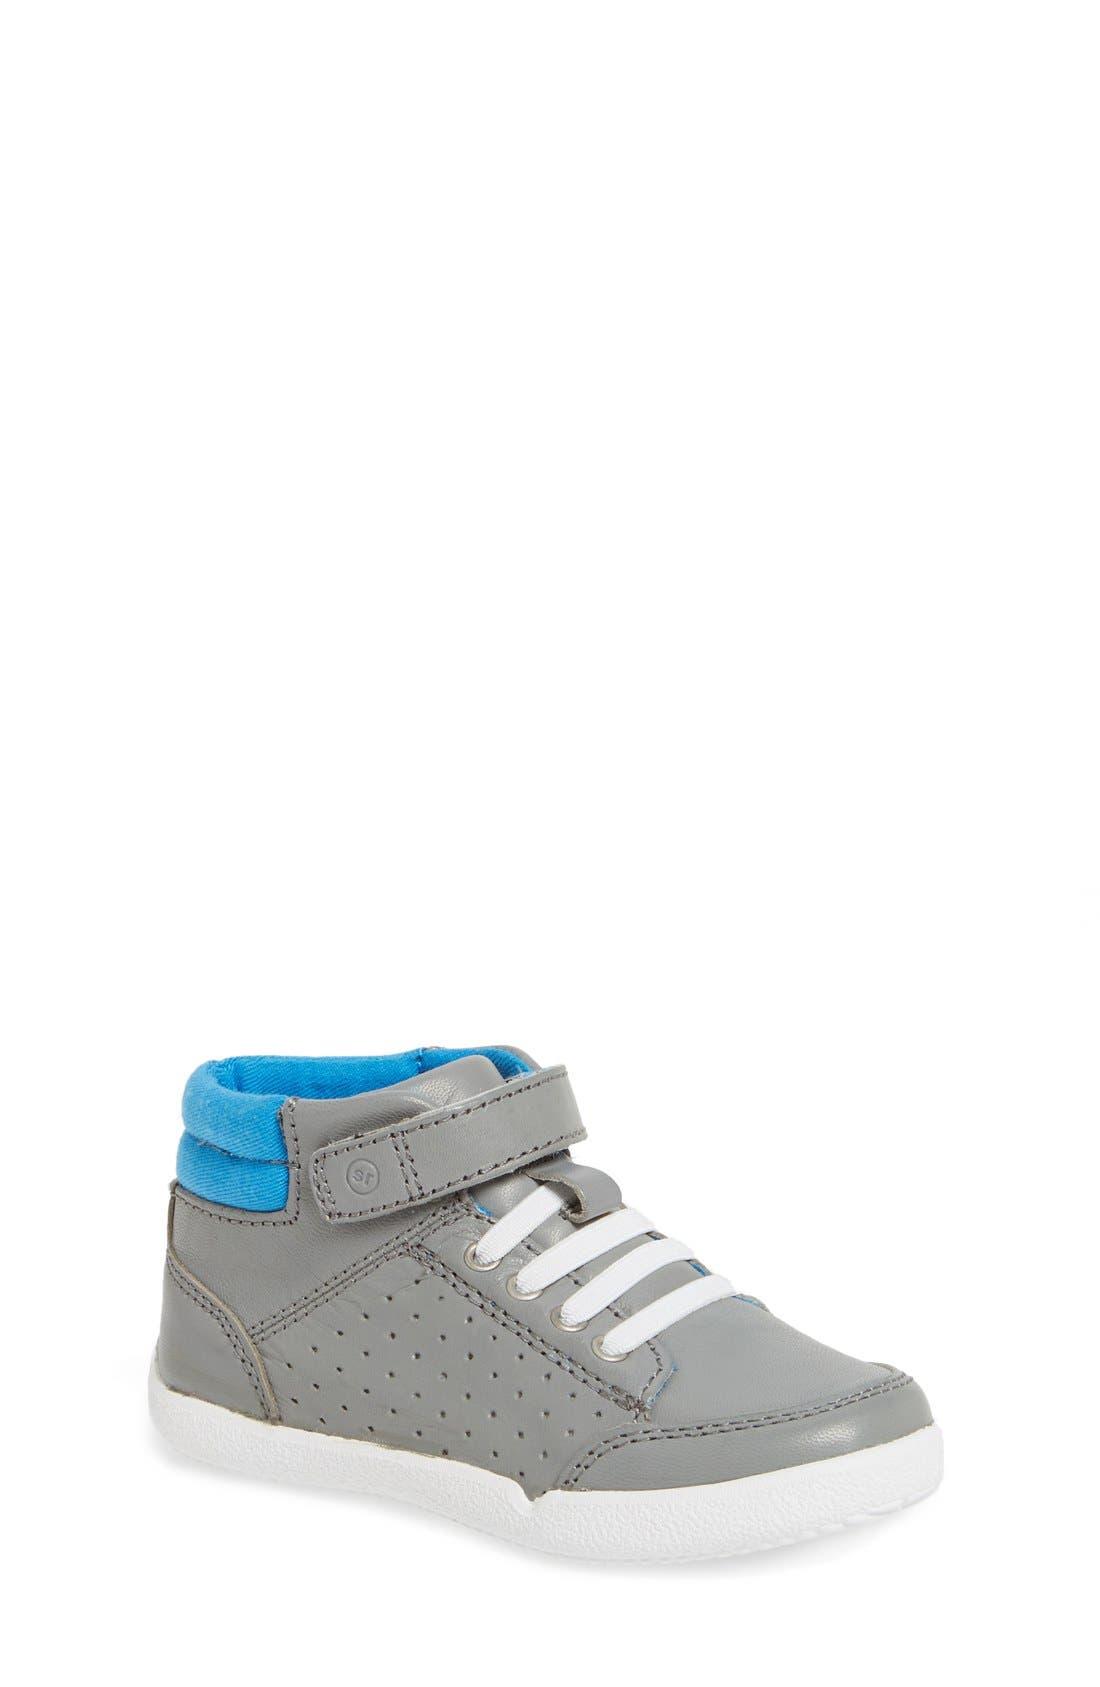 Stride Rite 'Stone' Sneaker (Baby, Walker & Toddler)